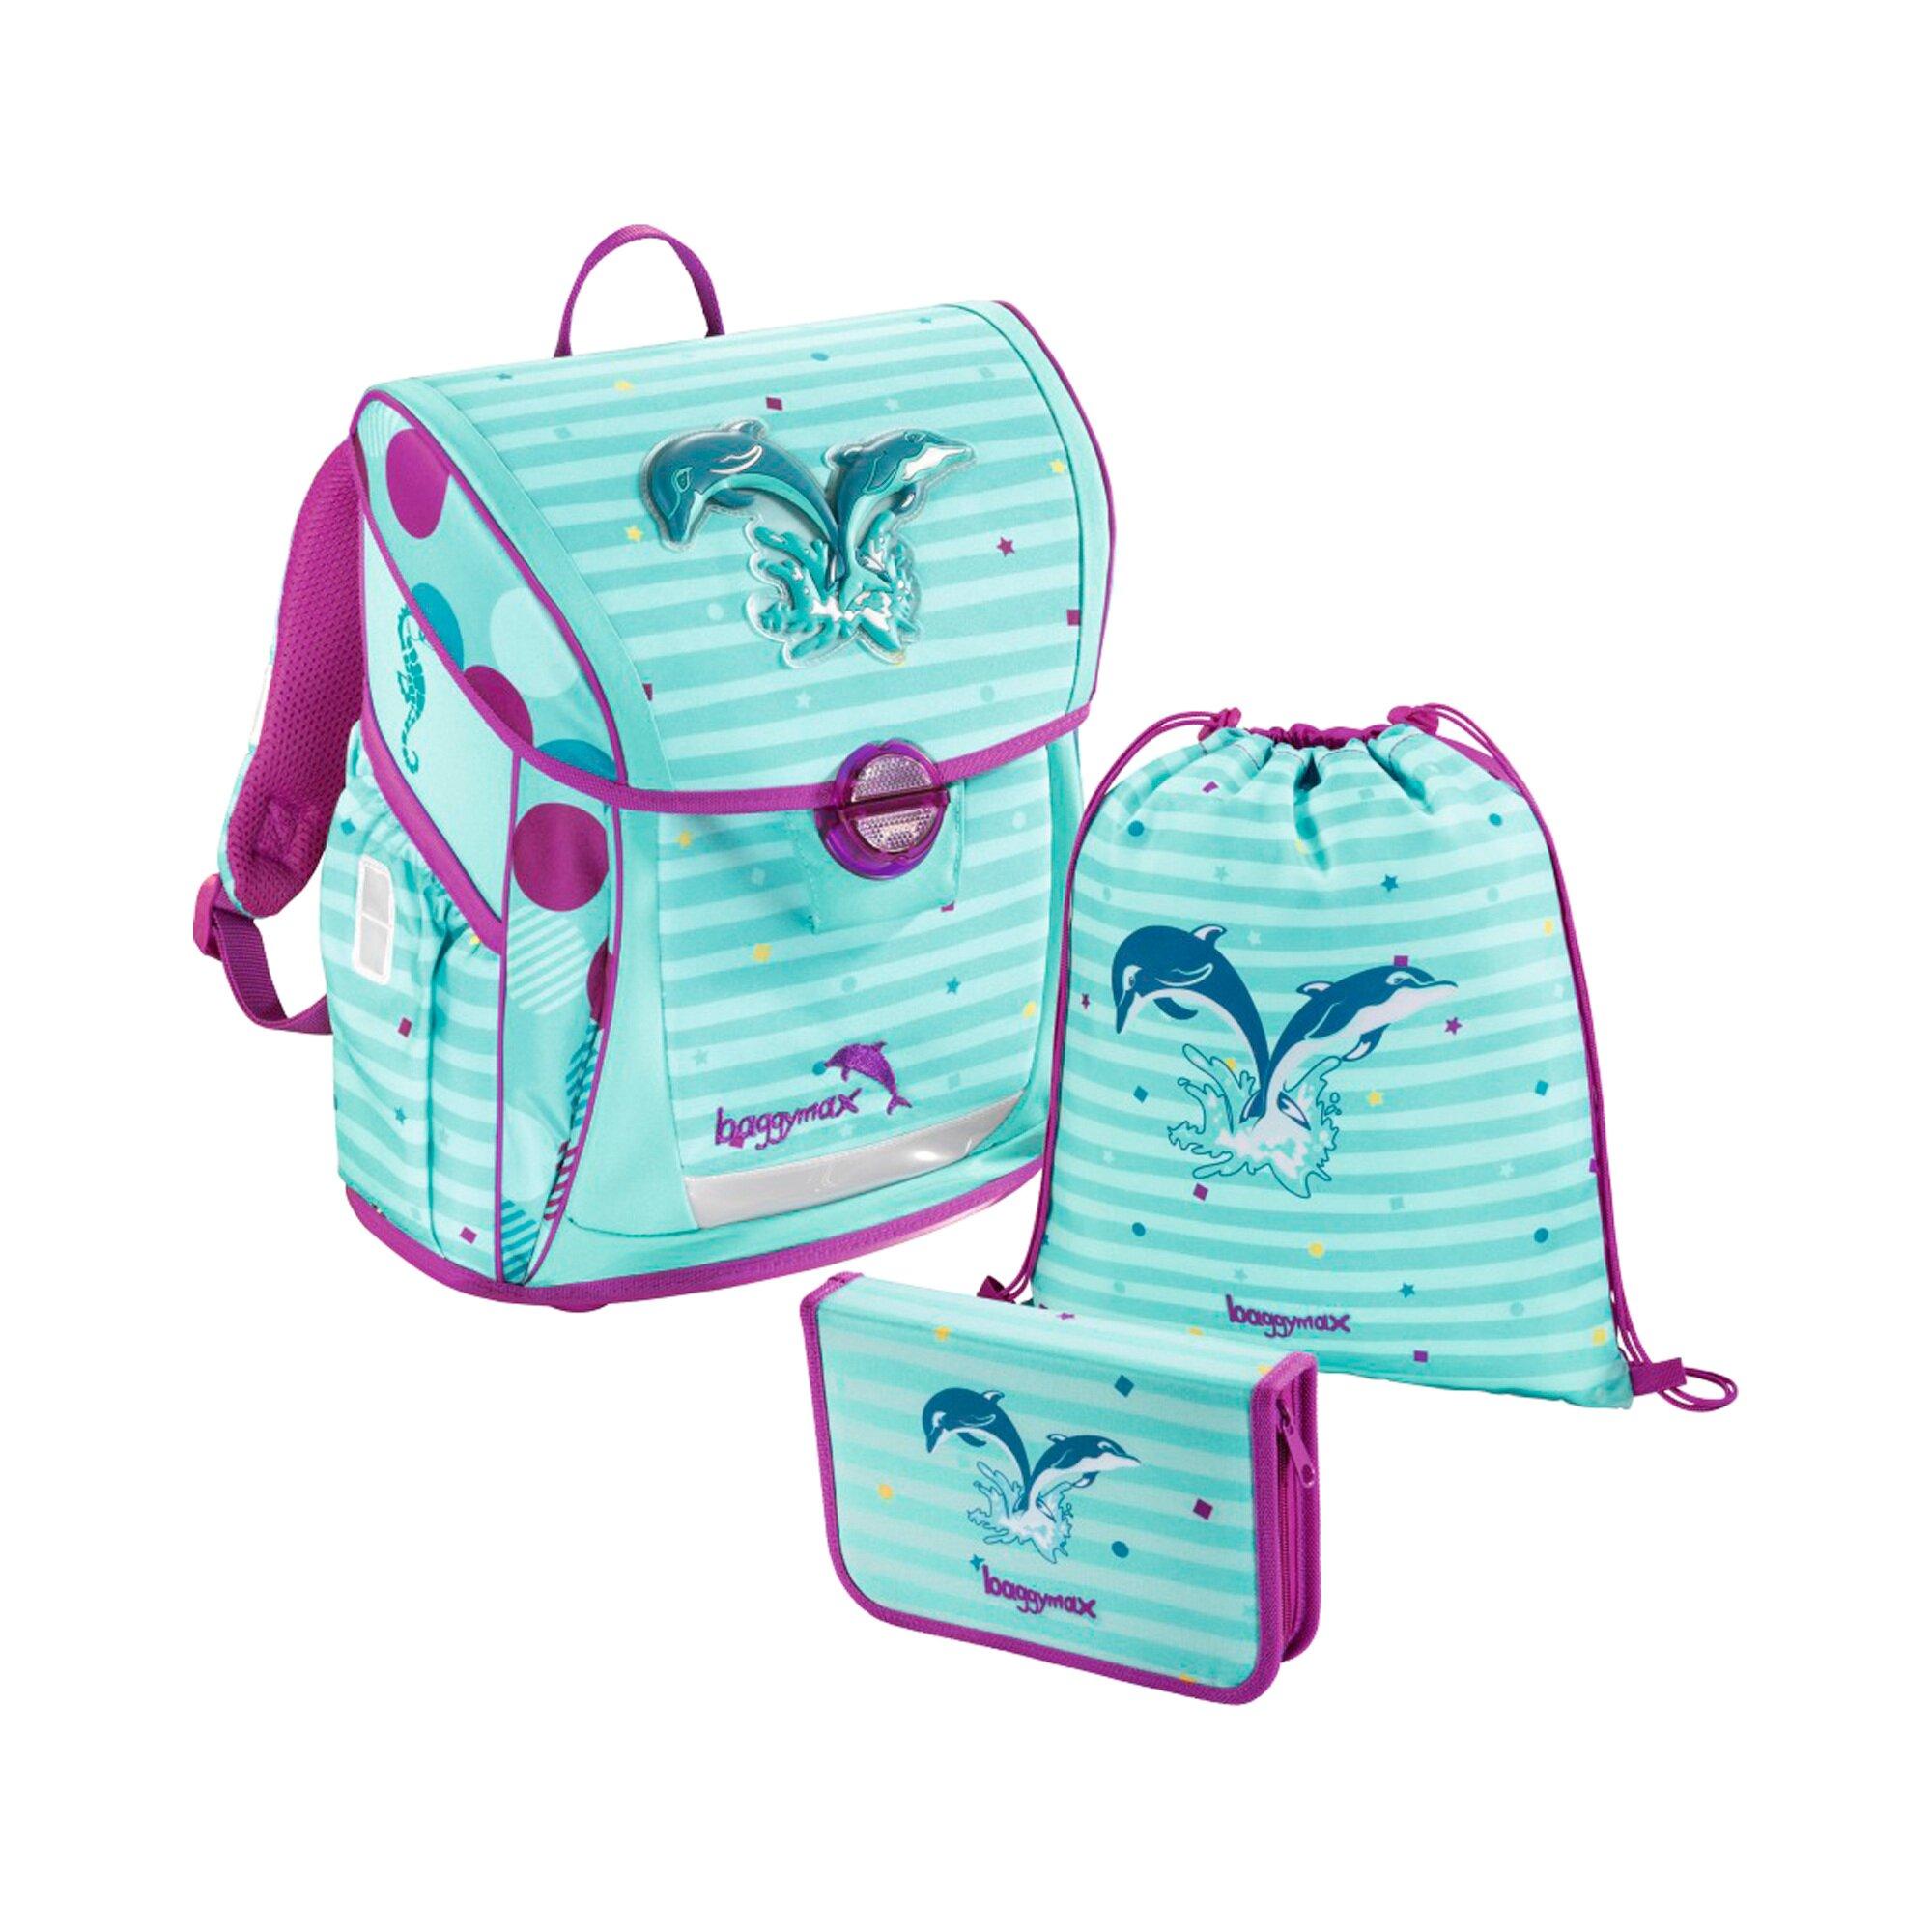 Baggymax Schulranzen-Set Fabby Dolphin 3-teilig